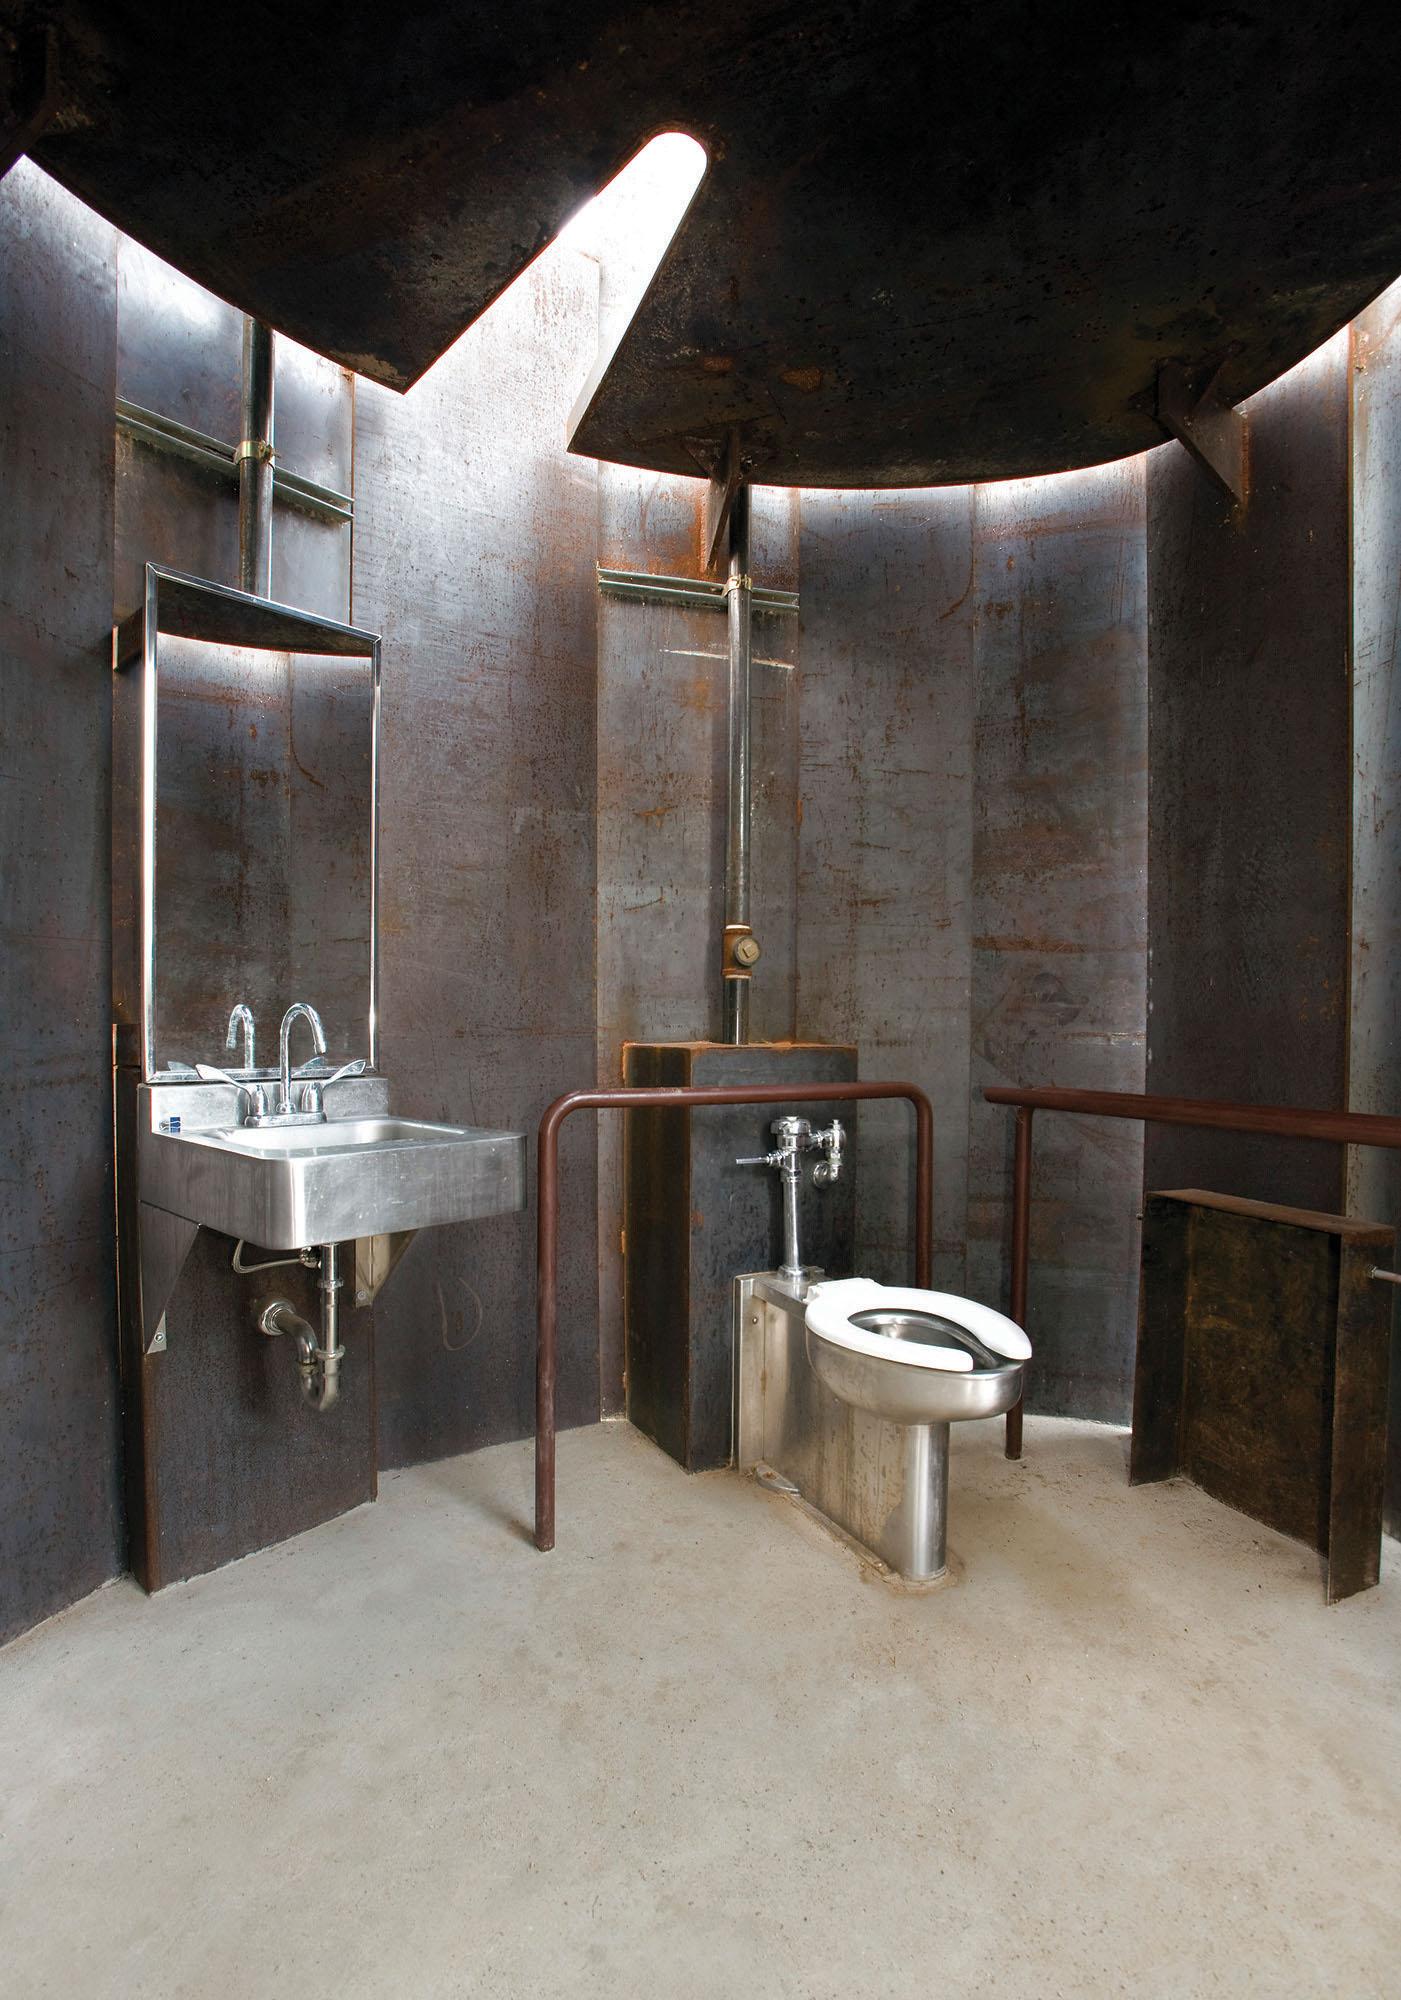 Cute Bathroom Rentals Cost Big Mosaic Bathrooms Design Rectangular Bath Room Floor Freestanding Bathroom Vanity Units Old Bathtub Ceramic Paint YellowTall Bathroom Vanity Height Game Of Thrones: Texas Toilet In Race For America\u0026#39;s Best Restroom ..